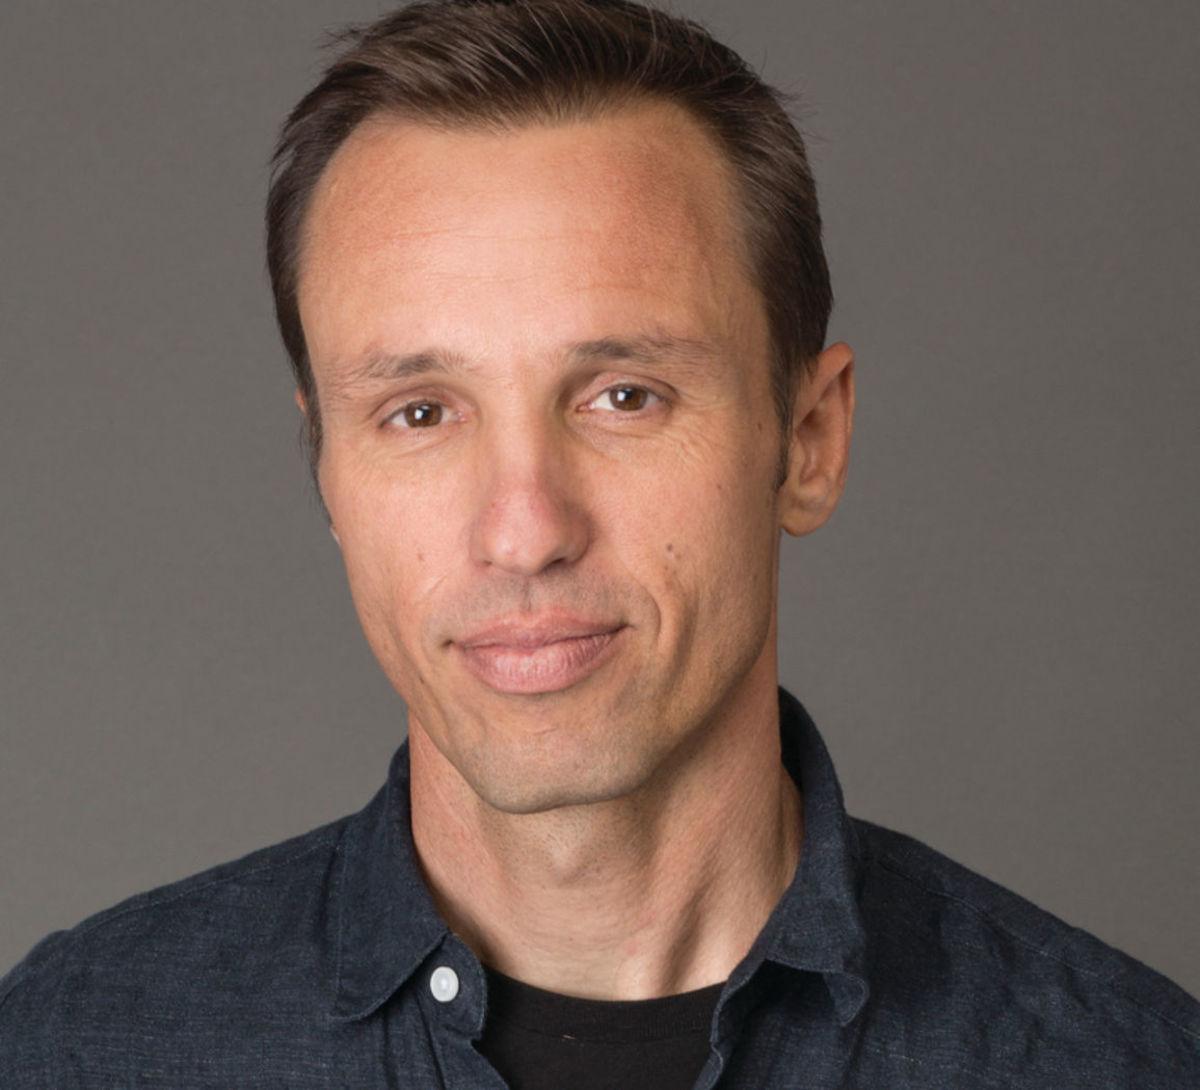 Markus Zusak, the book's author